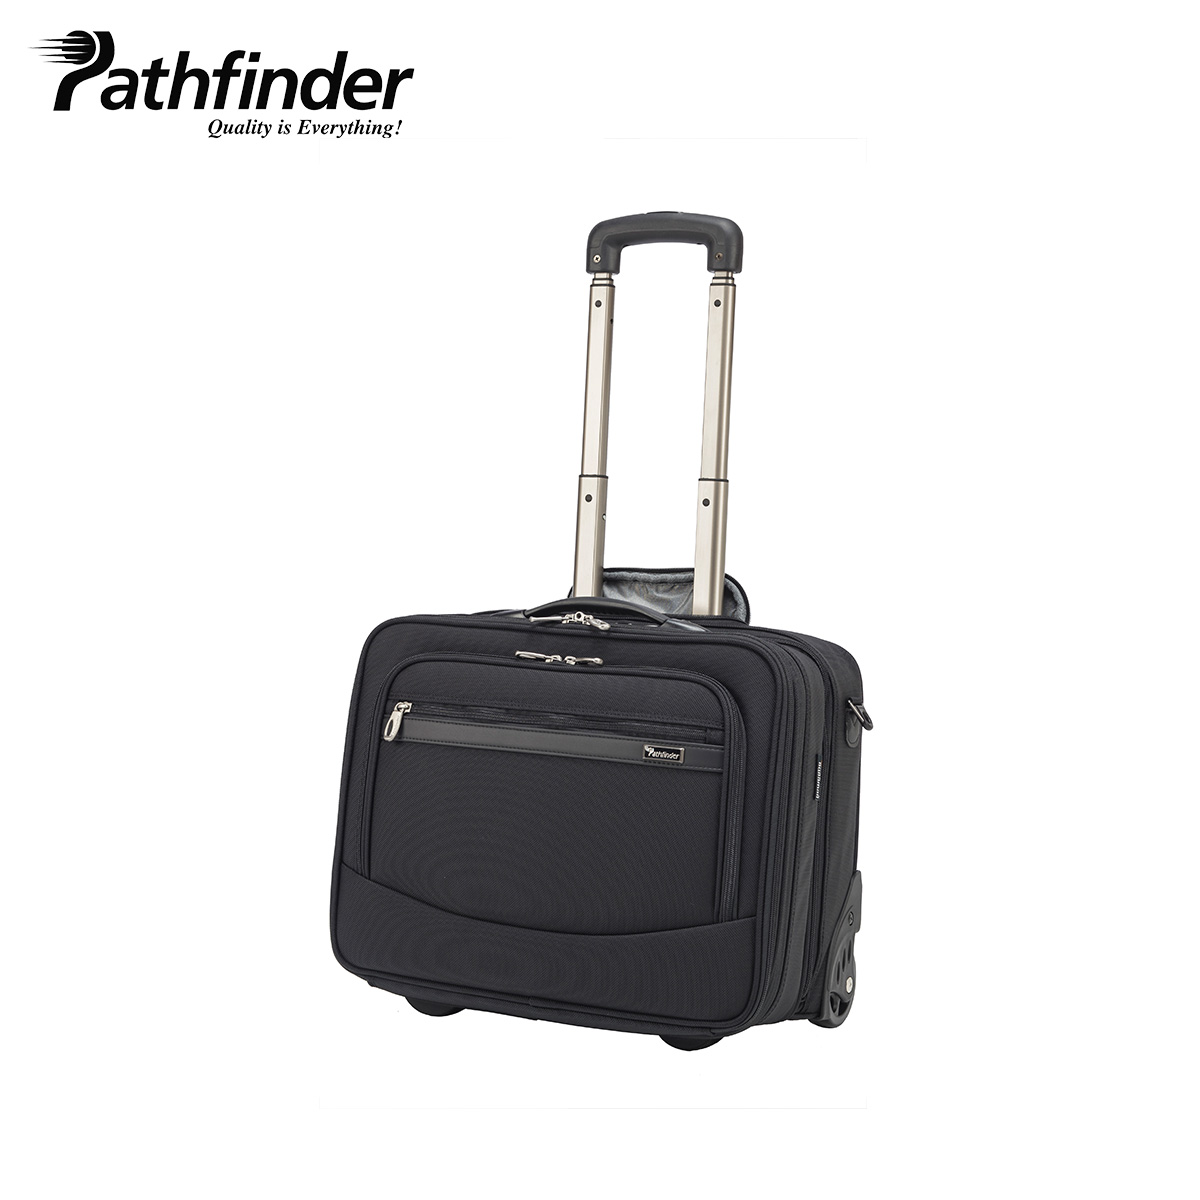 Pathfinder REVOLUTION XT パスファインダー バッグ キャリーケース キャリーバッグ スーツケース 24L-30L メンズ 機内持ち込み ソフト 拡張 ブラック 黒 PF6877B